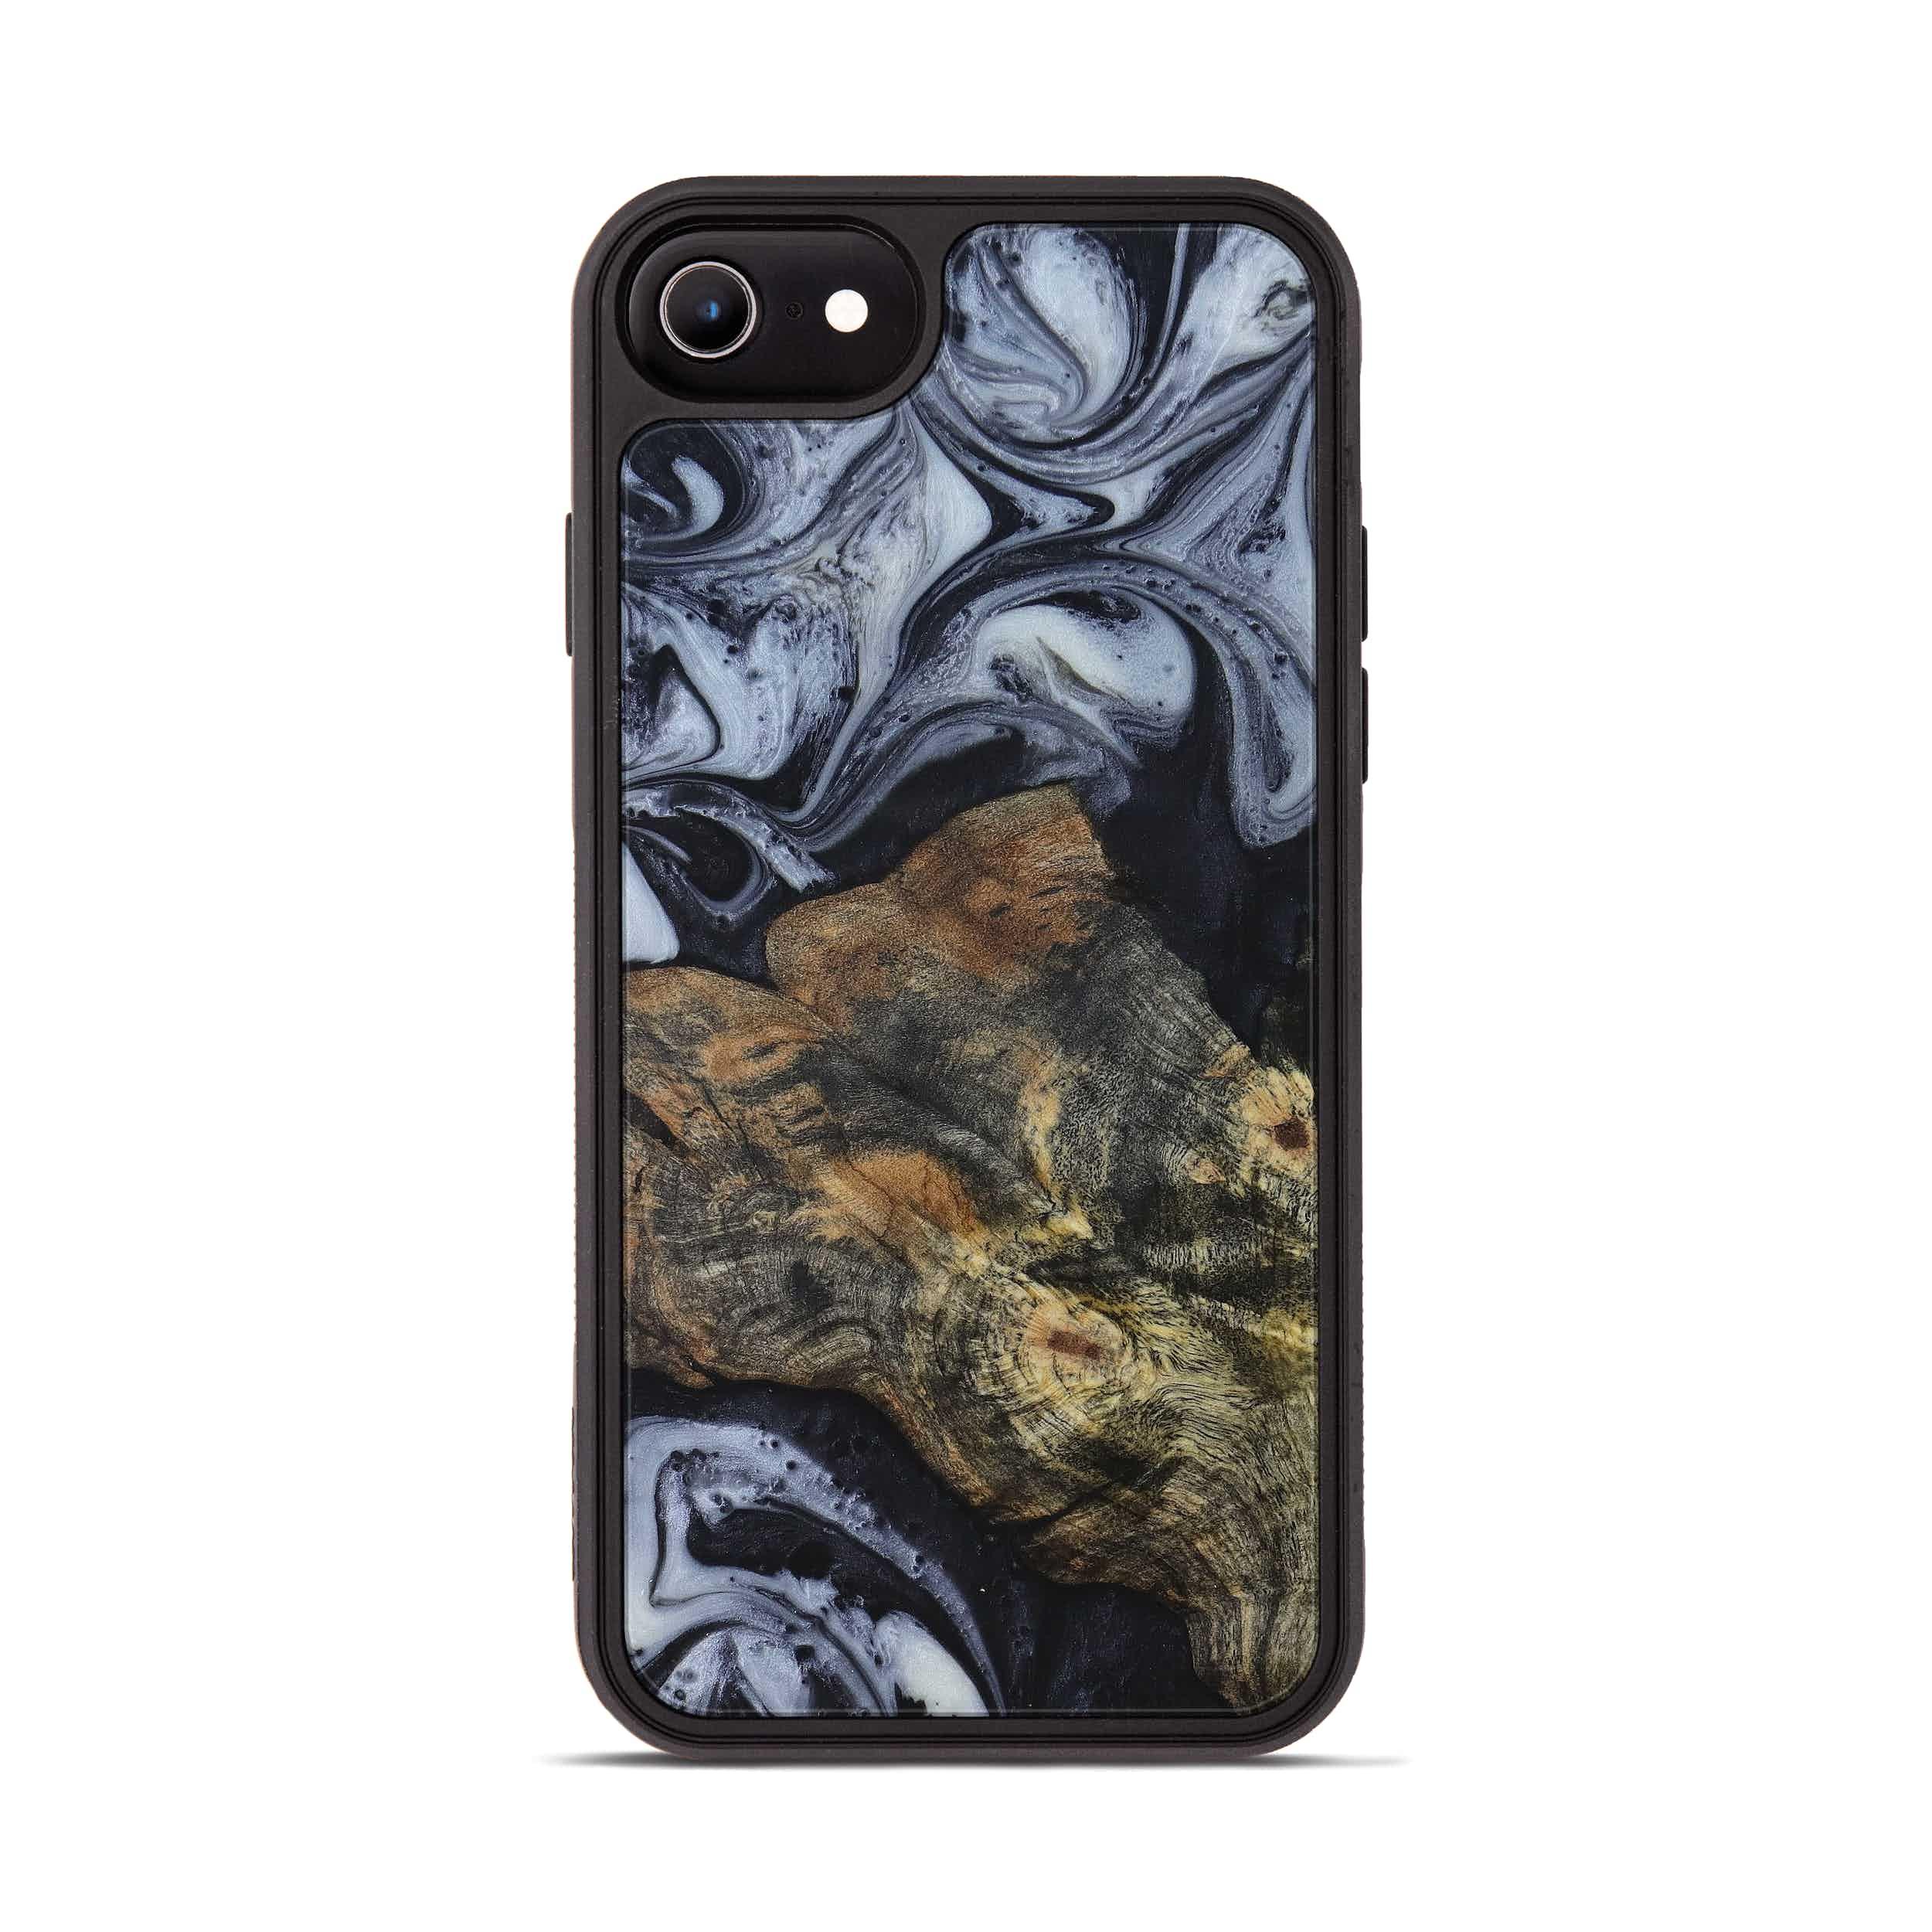 iPhone 6s Wood+Resin Phone Case - Radha (Black & White, 397921)